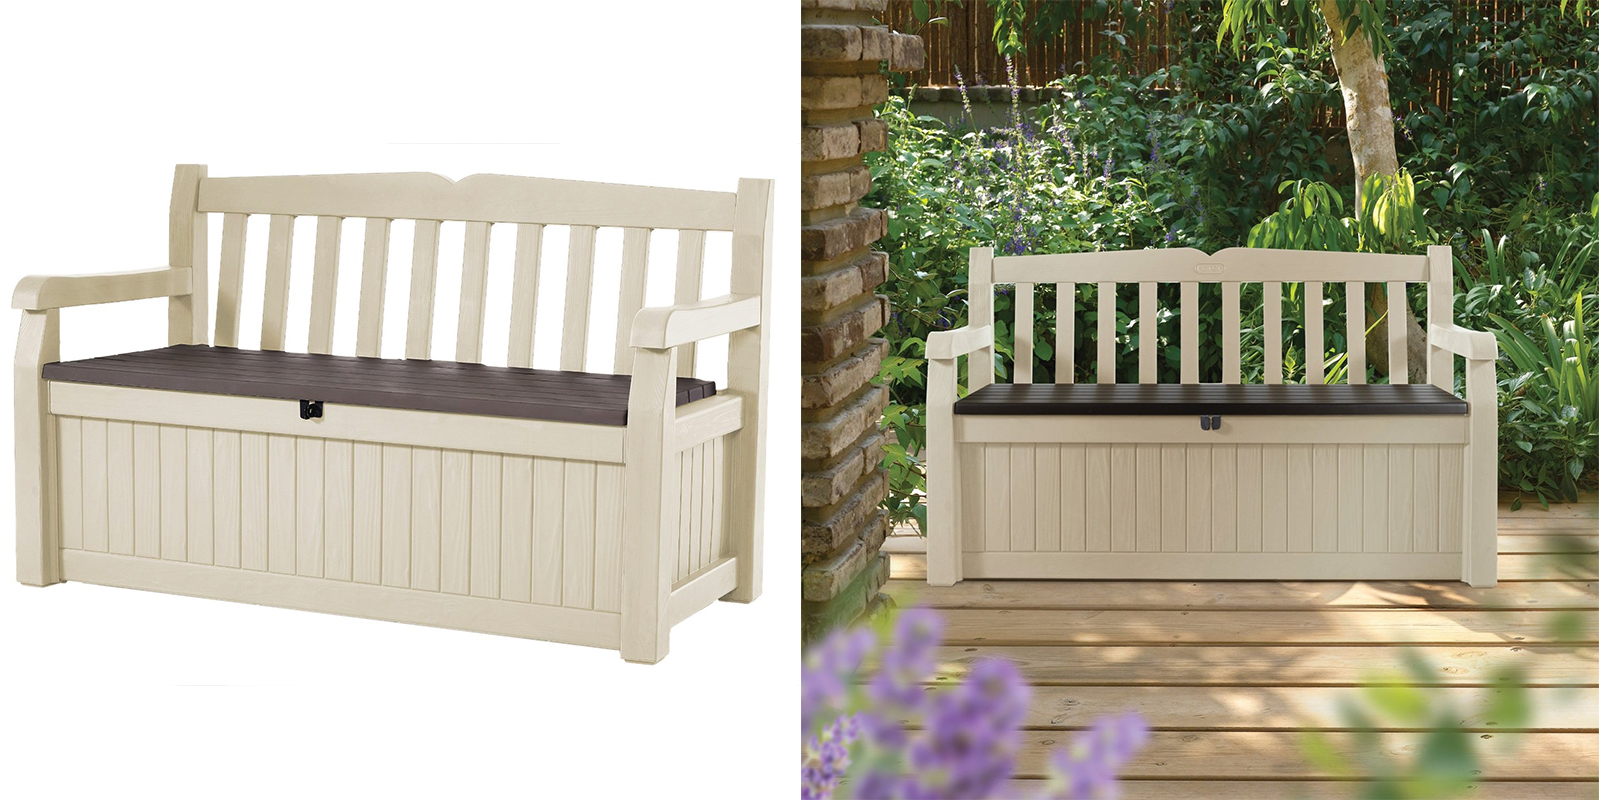 Patio Chair - Outdoor Patio Storage Bench